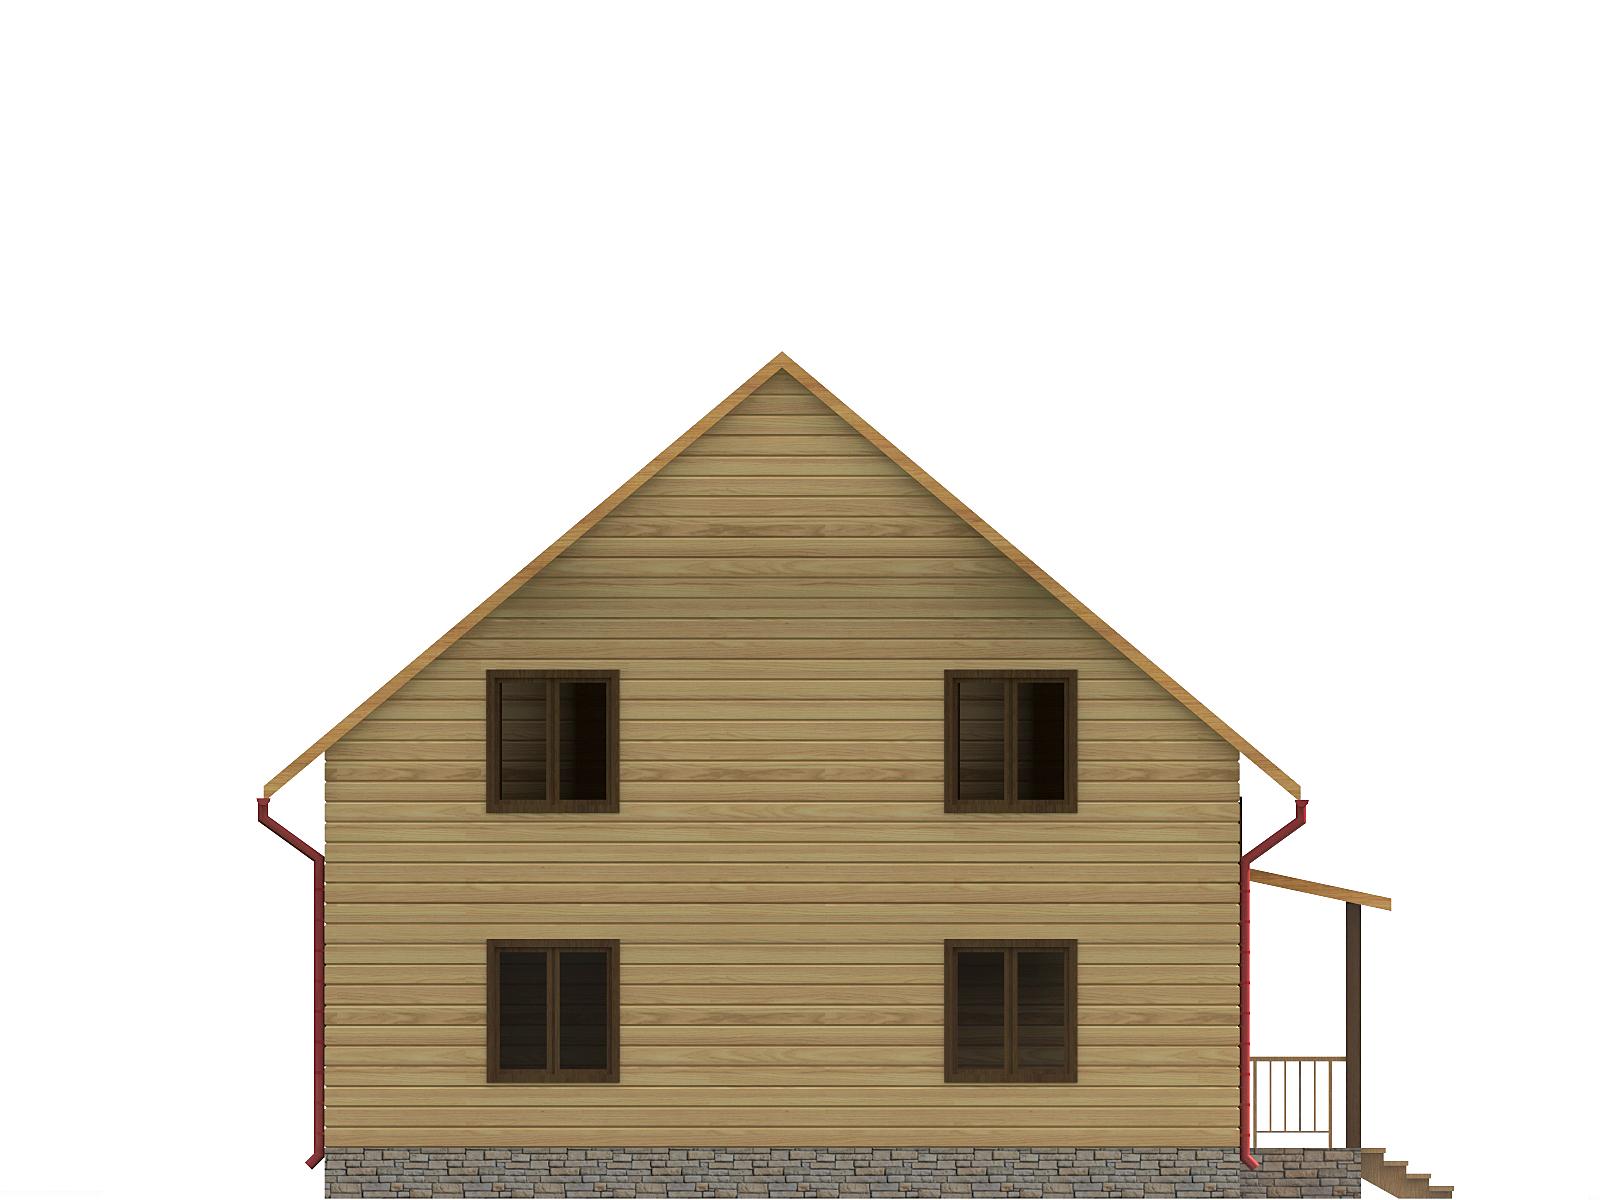 dom-iz-brusa-9x9-s-mansardoi-1.5-etazha -razrez4